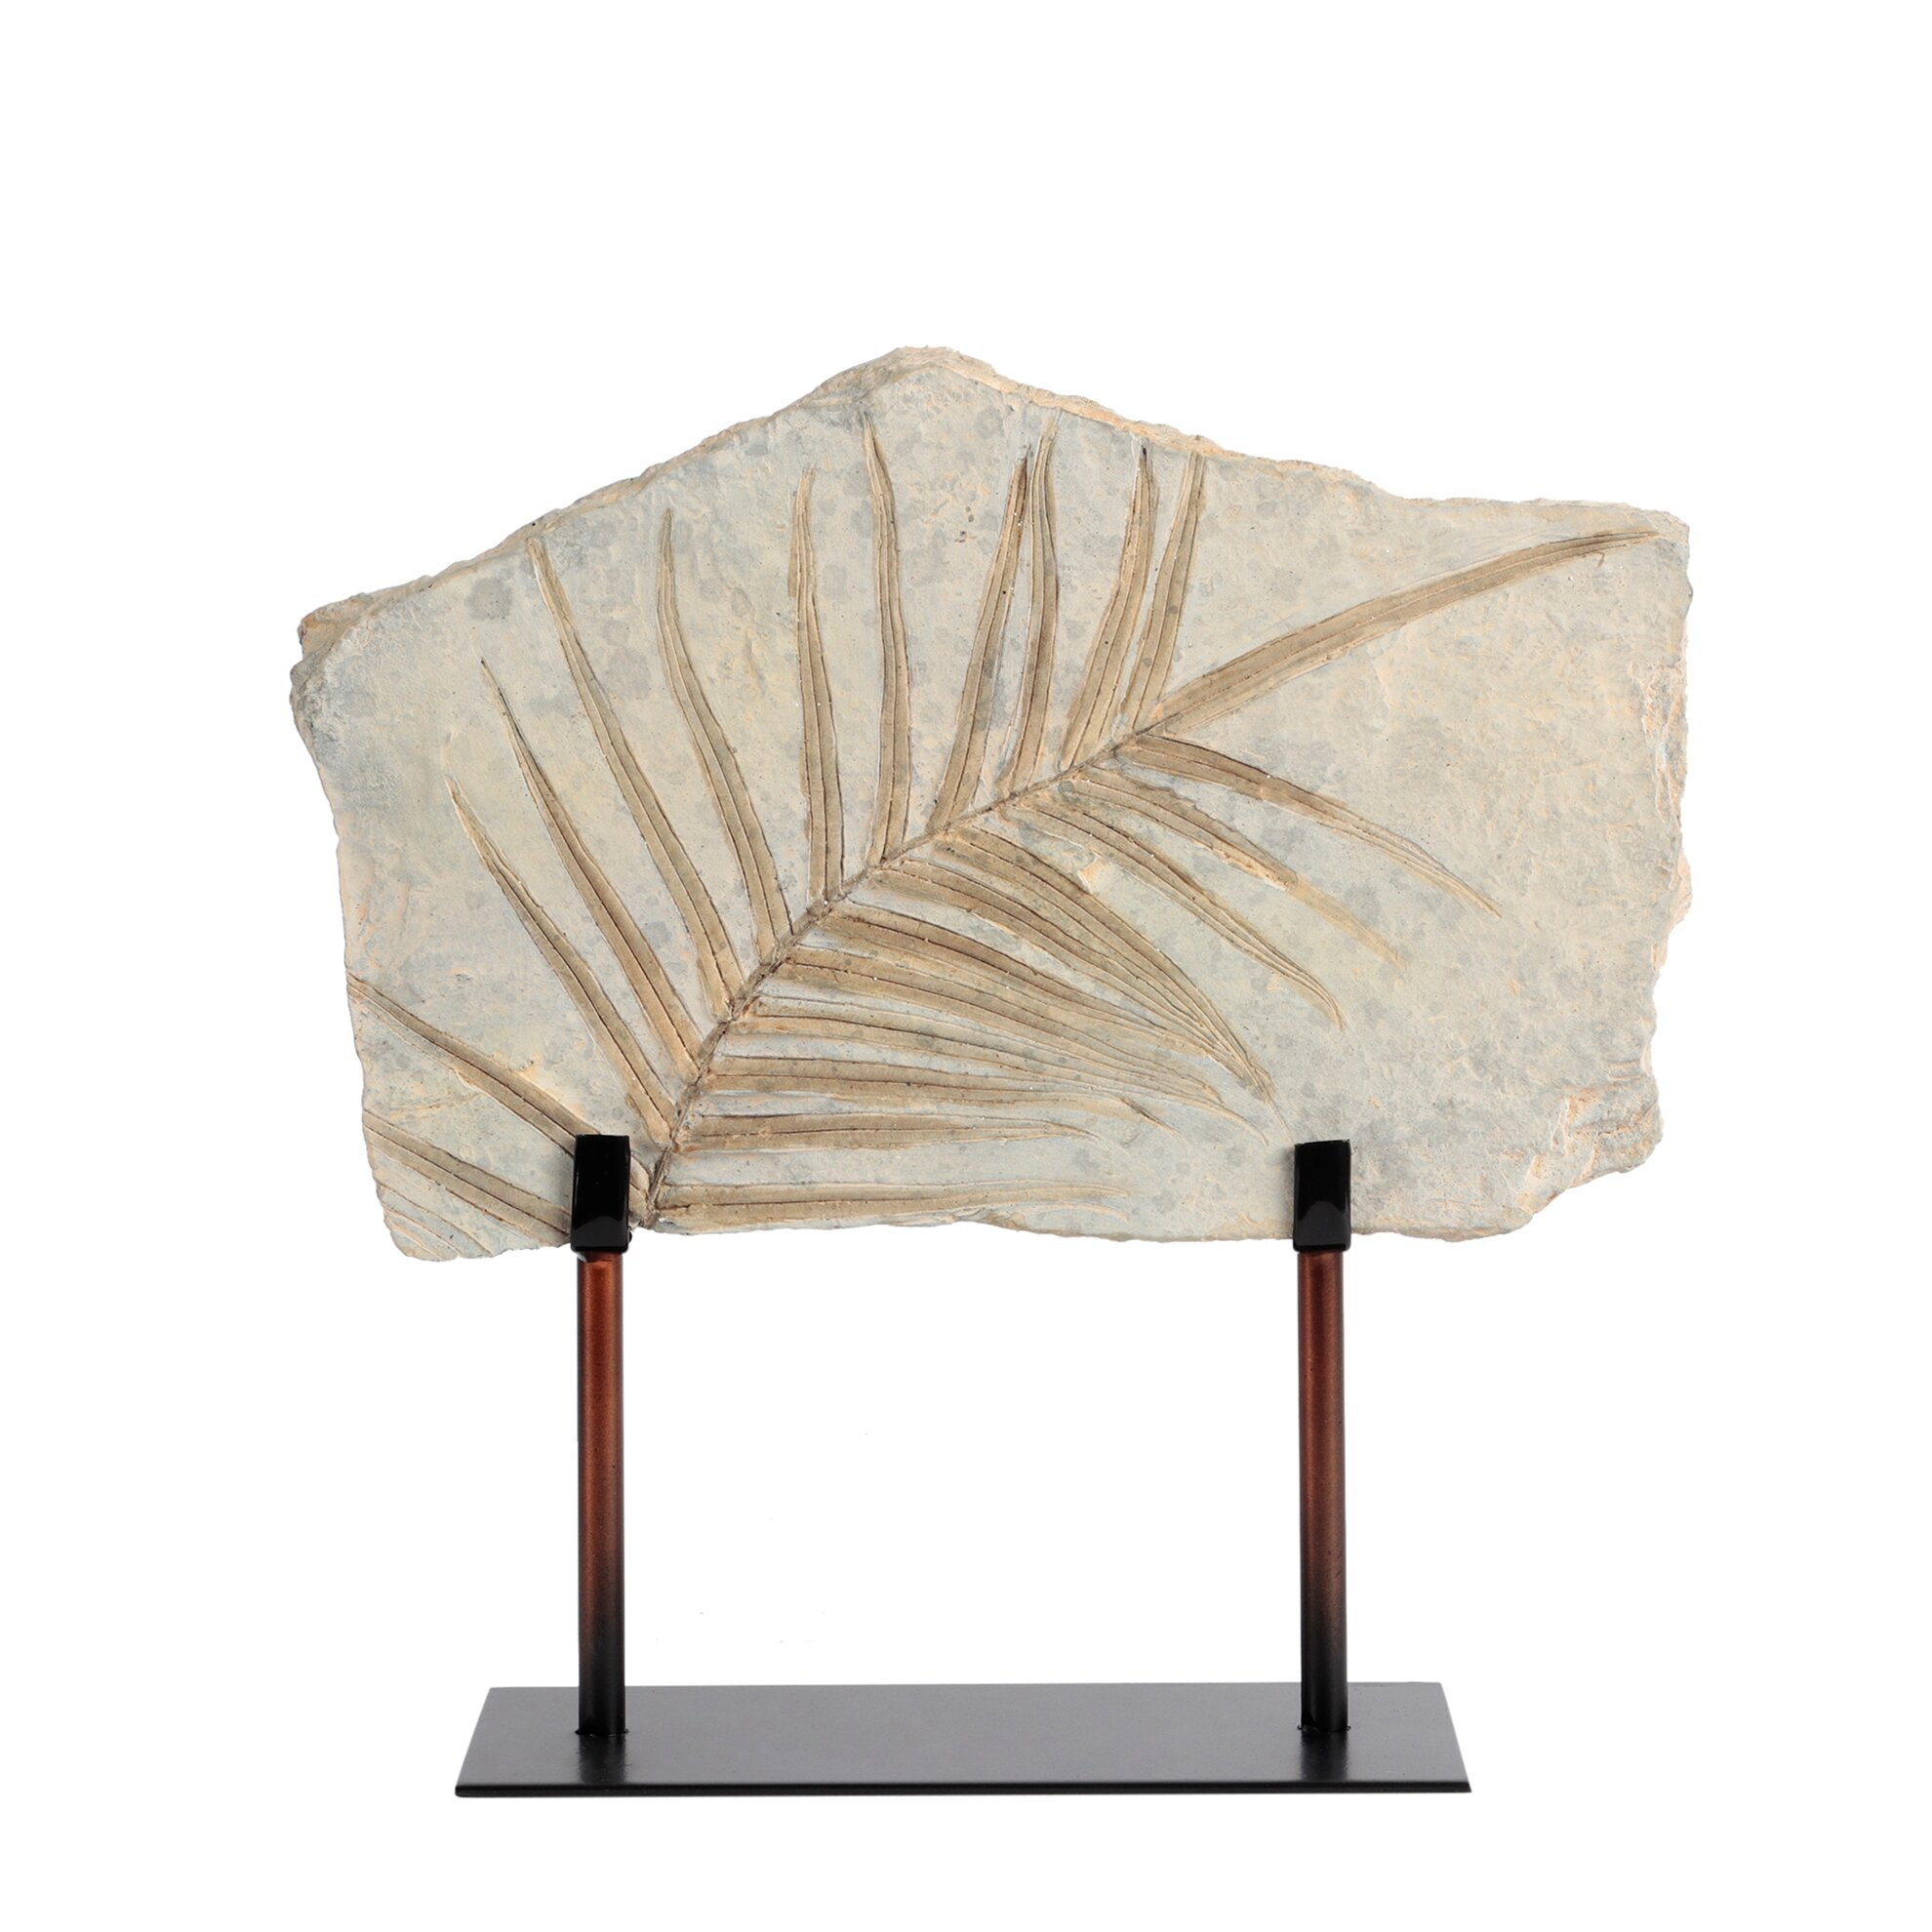 Dekoratif Obje (28x10x28cm)